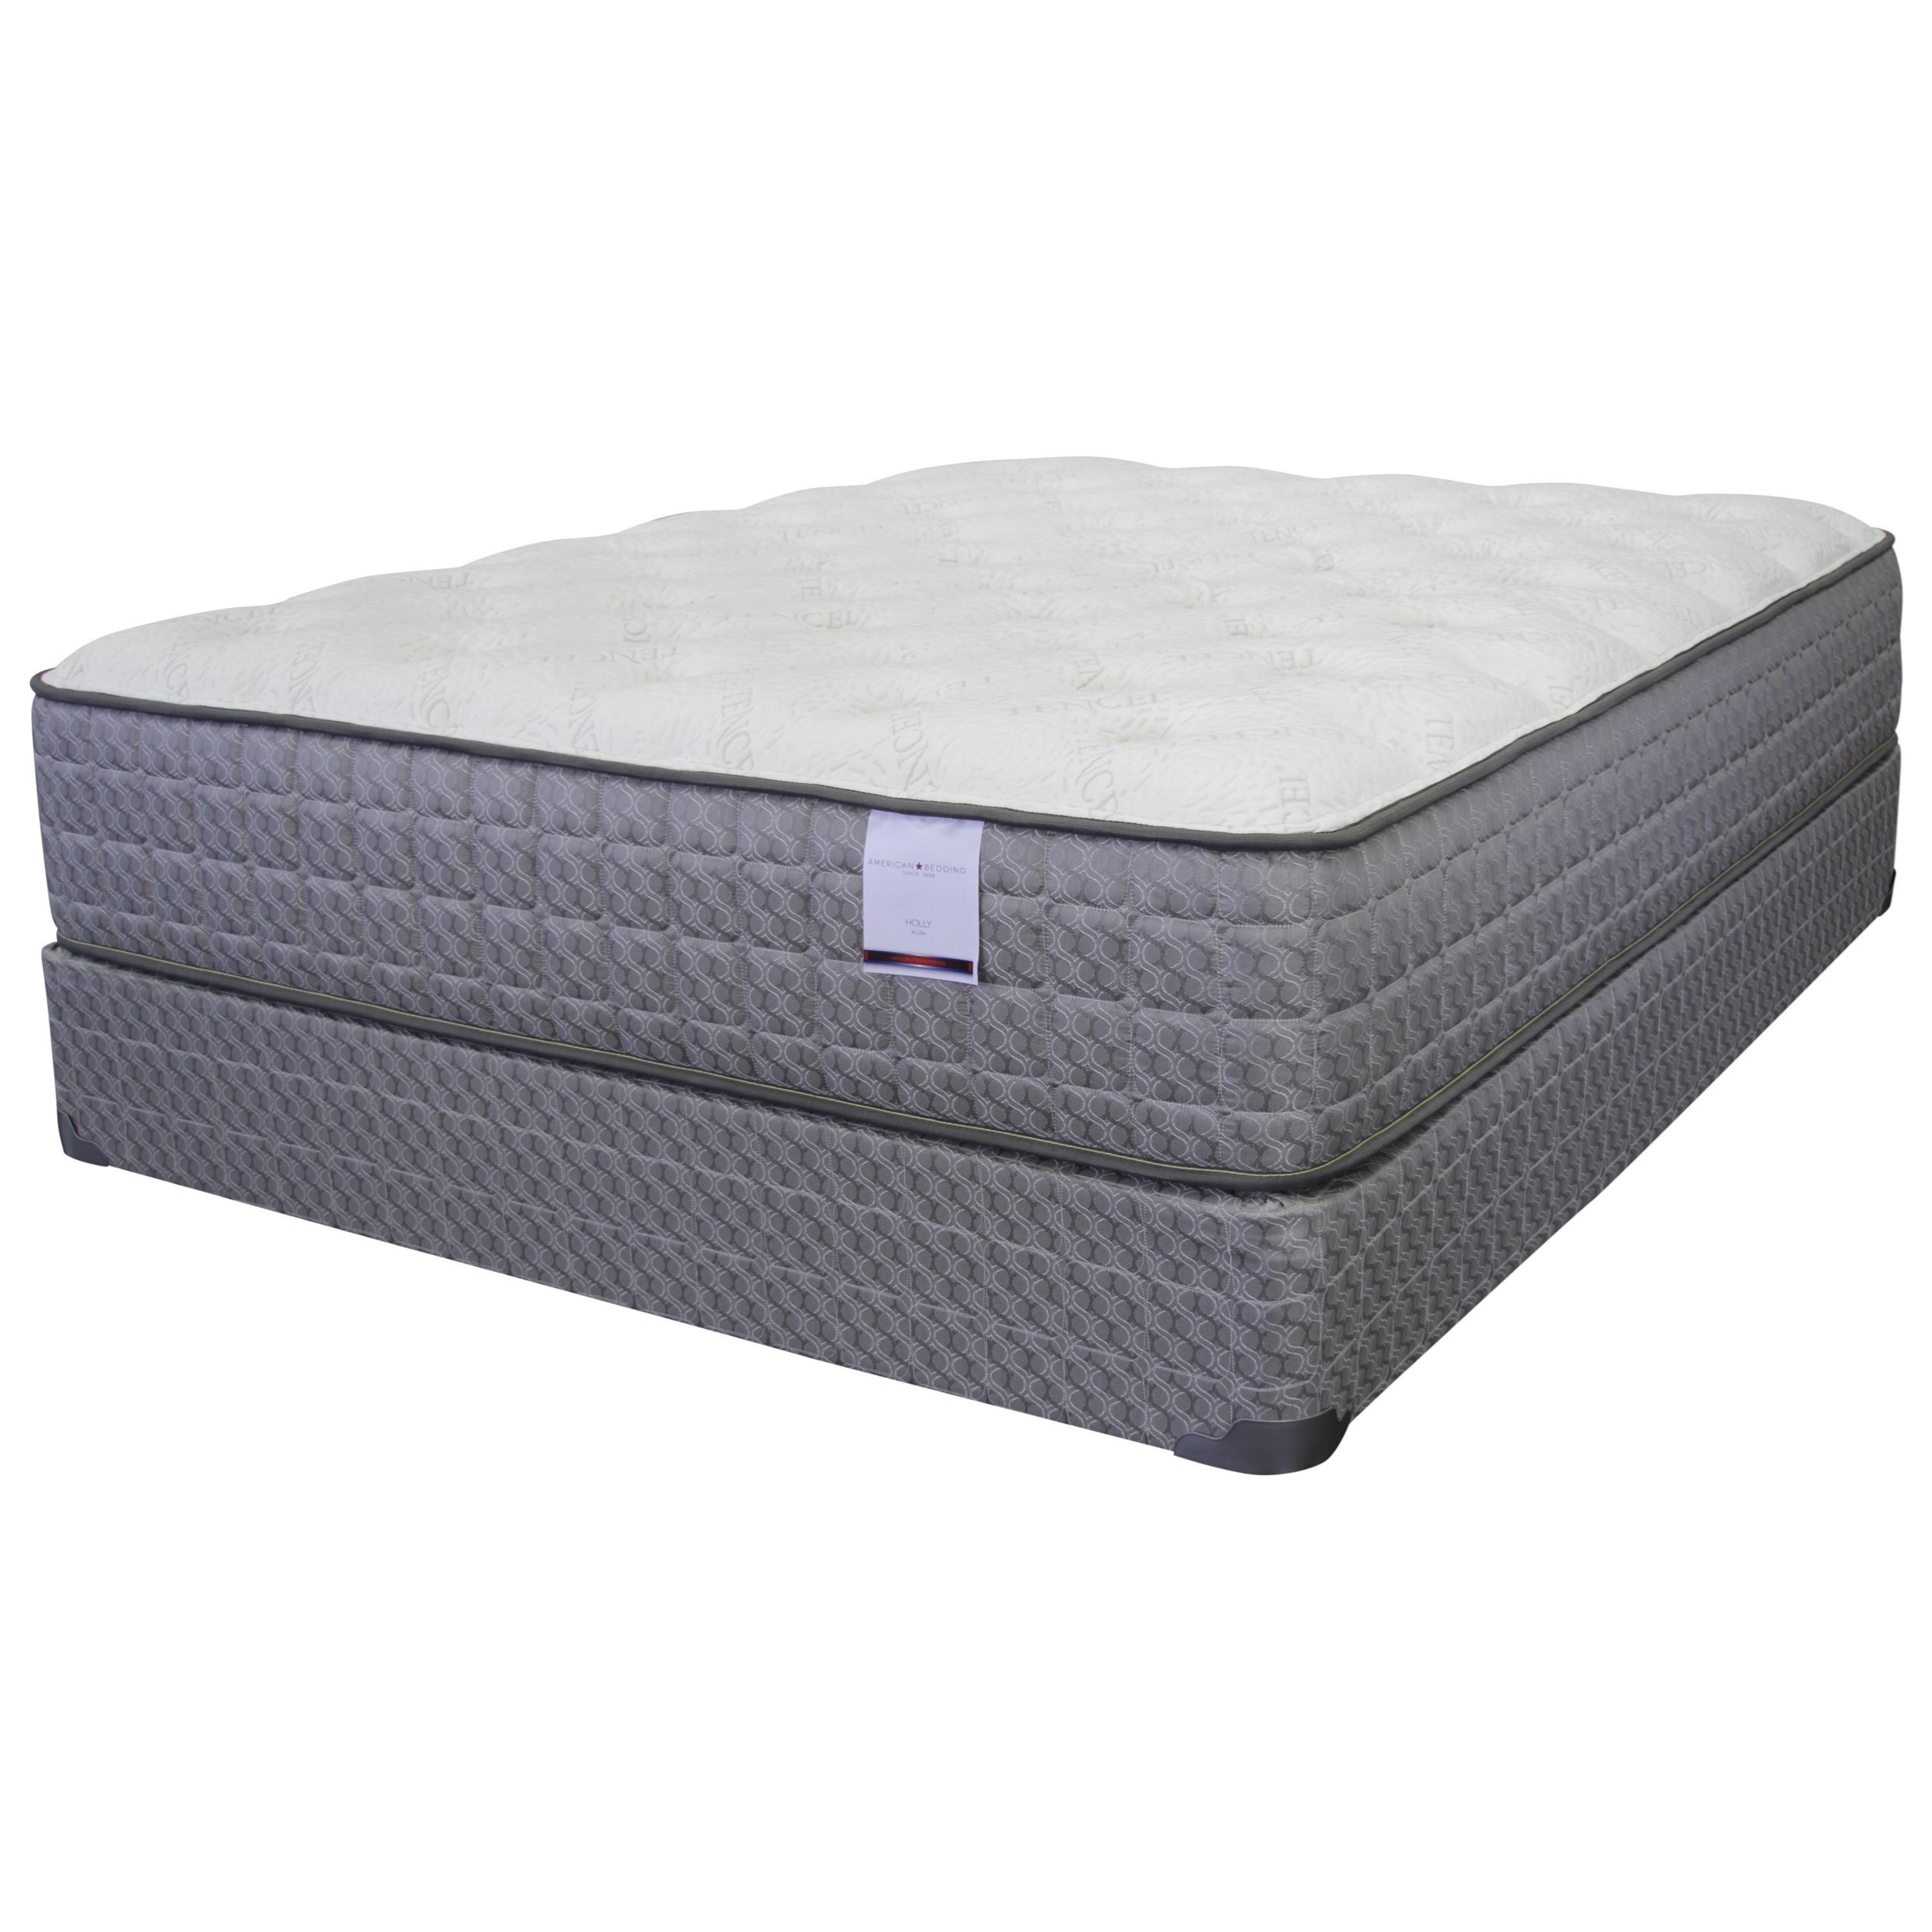 American Bedding Company Holly Plush King 13 Plush Mattress Ivan Smith Furniture Mattress